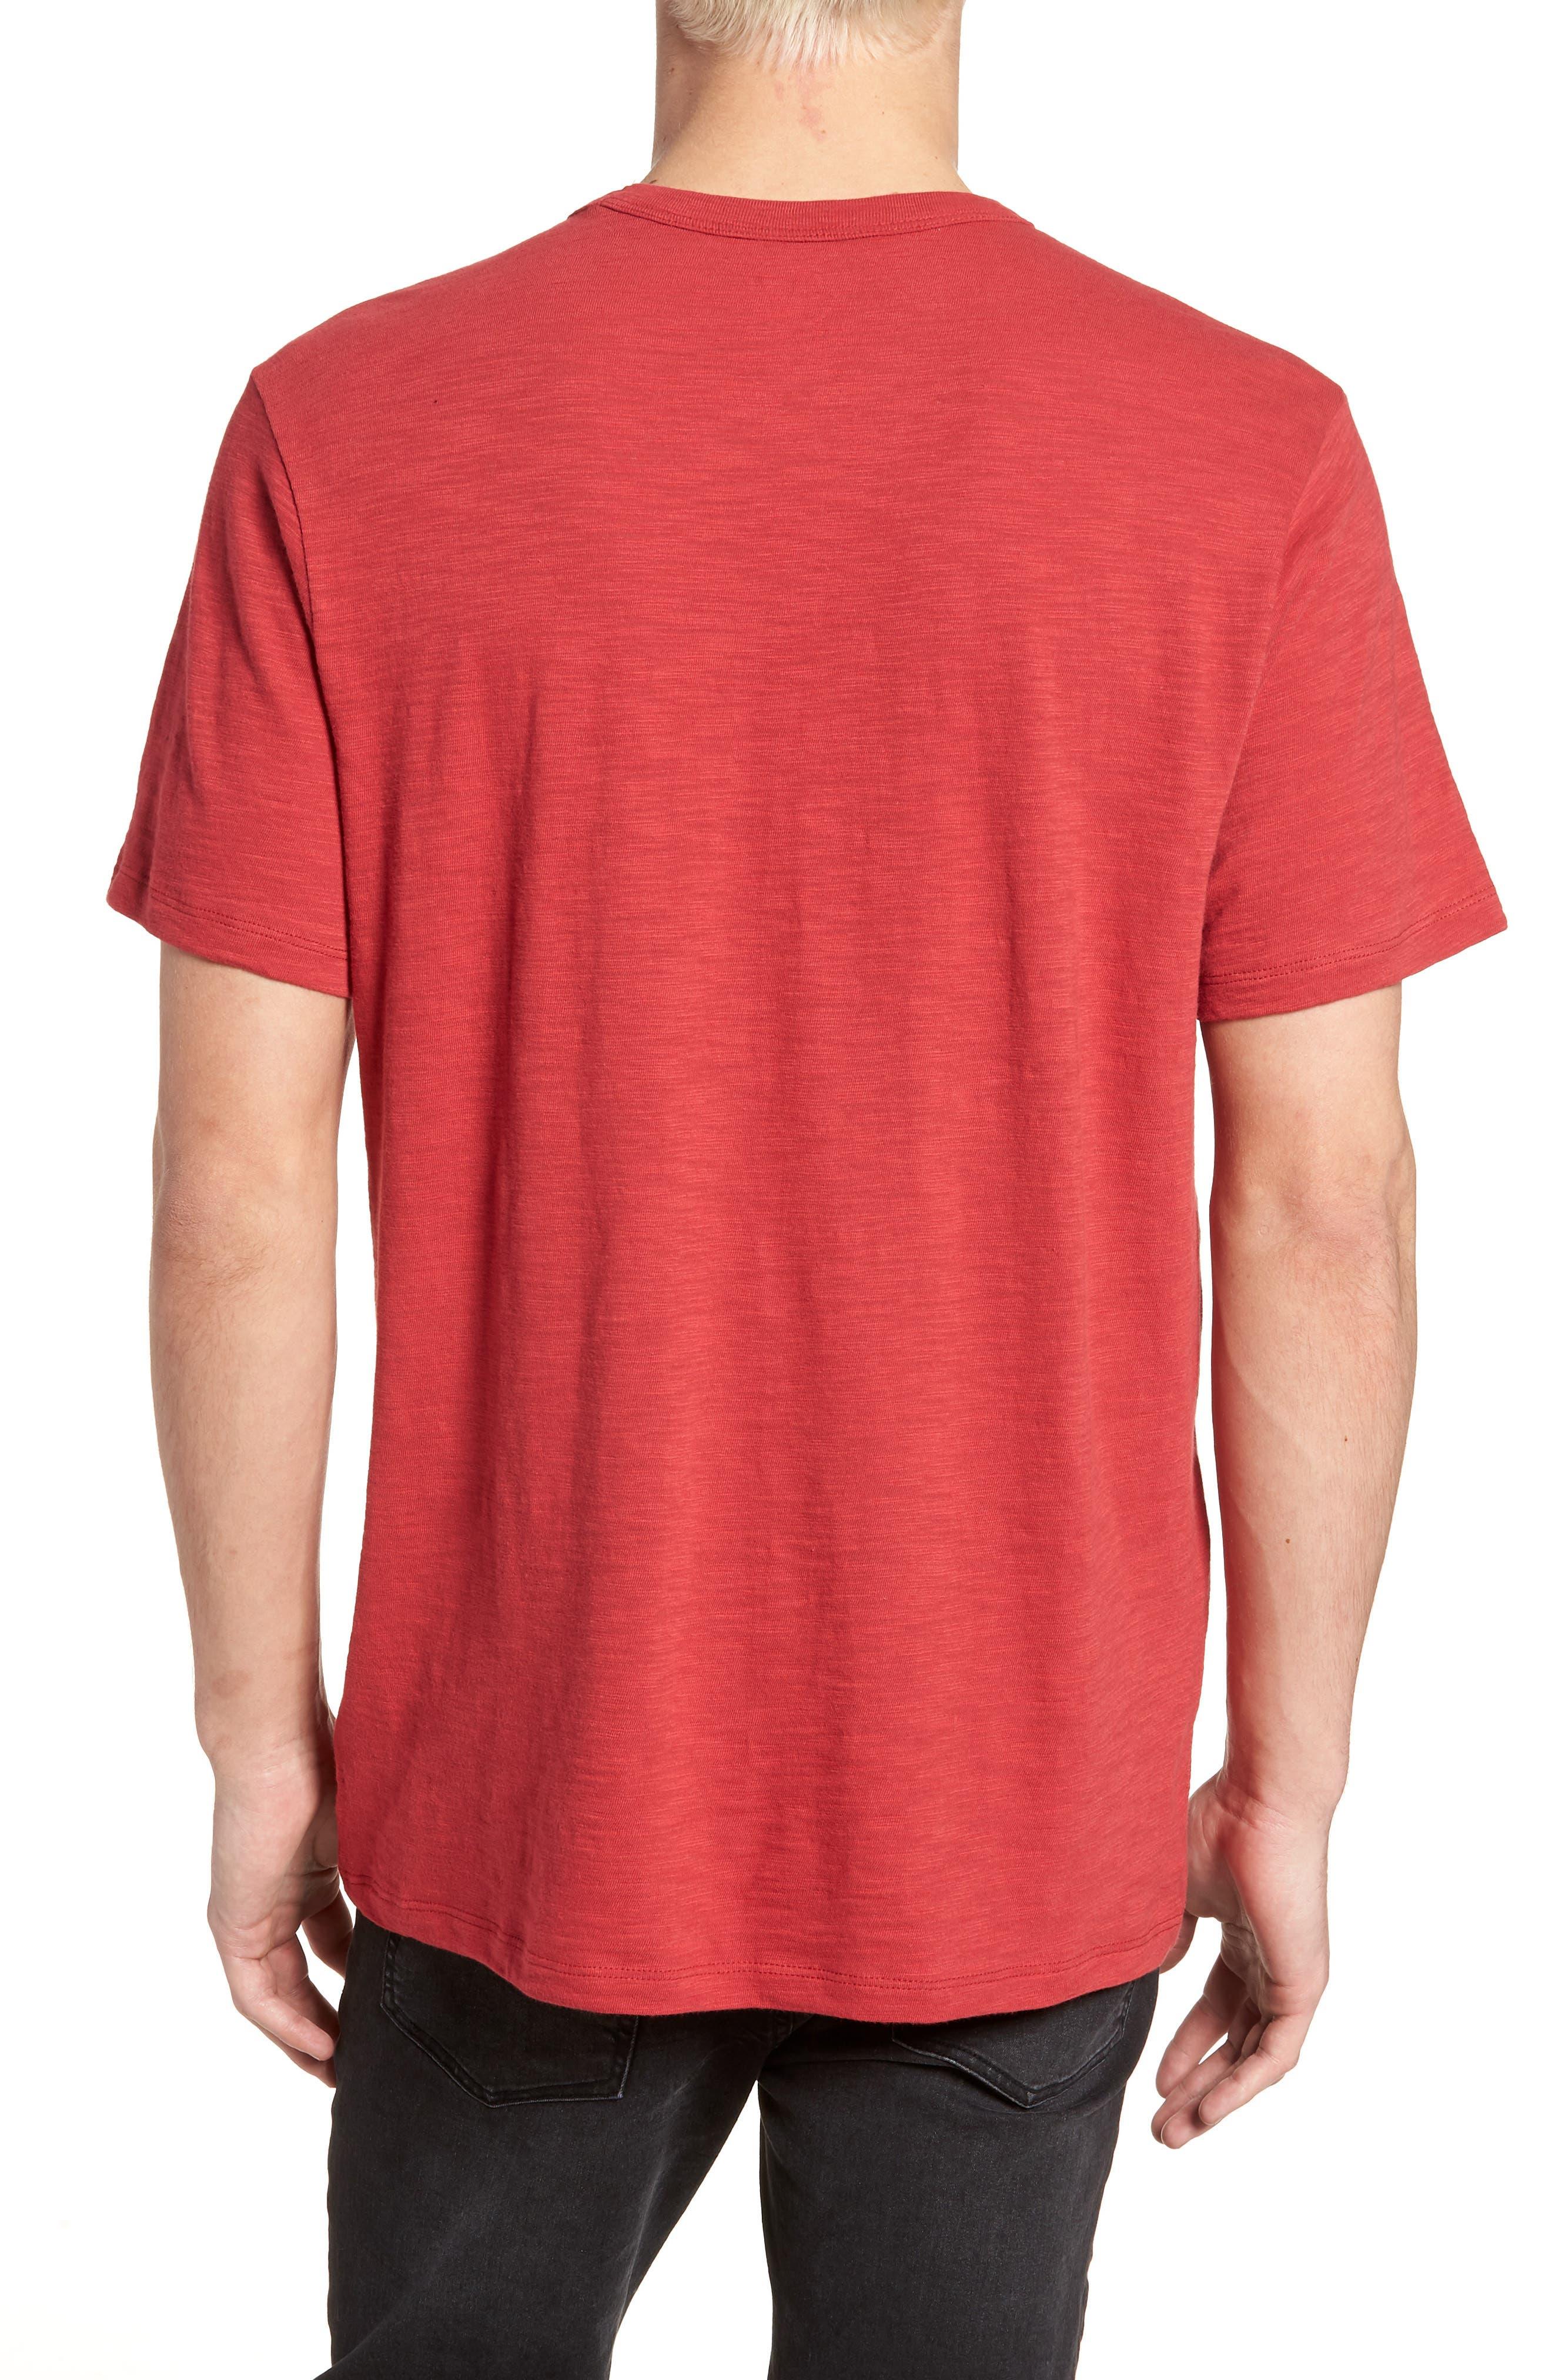 Grit Scrum St. Louis Cardinals T-Shirt,                             Alternate thumbnail 2, color,                             Rescue Red